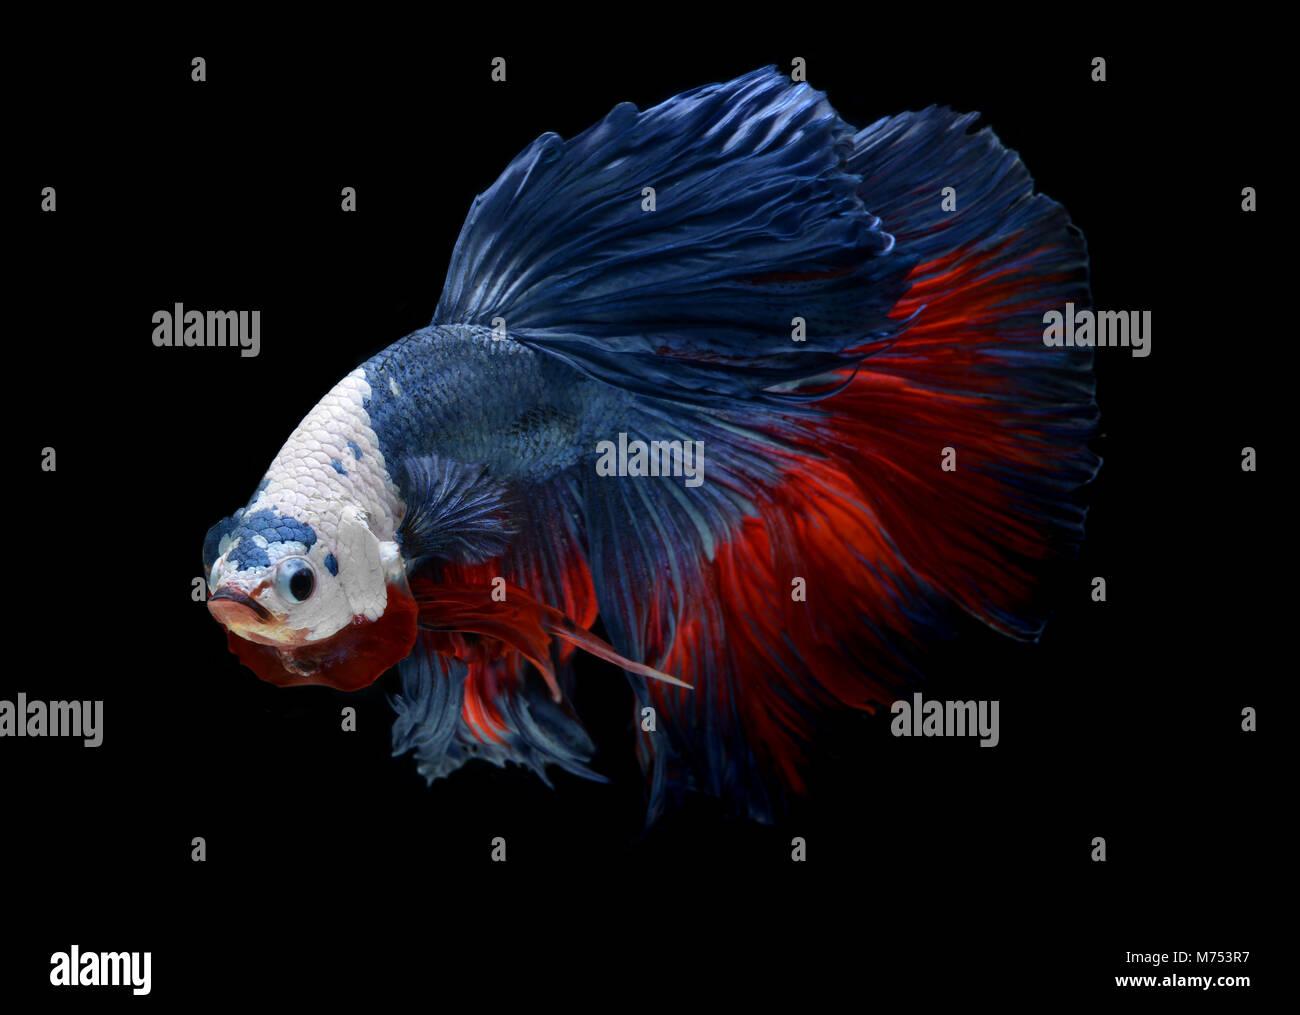 Fancy monster white head betta or saimese fighting fish like the dragon swiming . Stock Photo